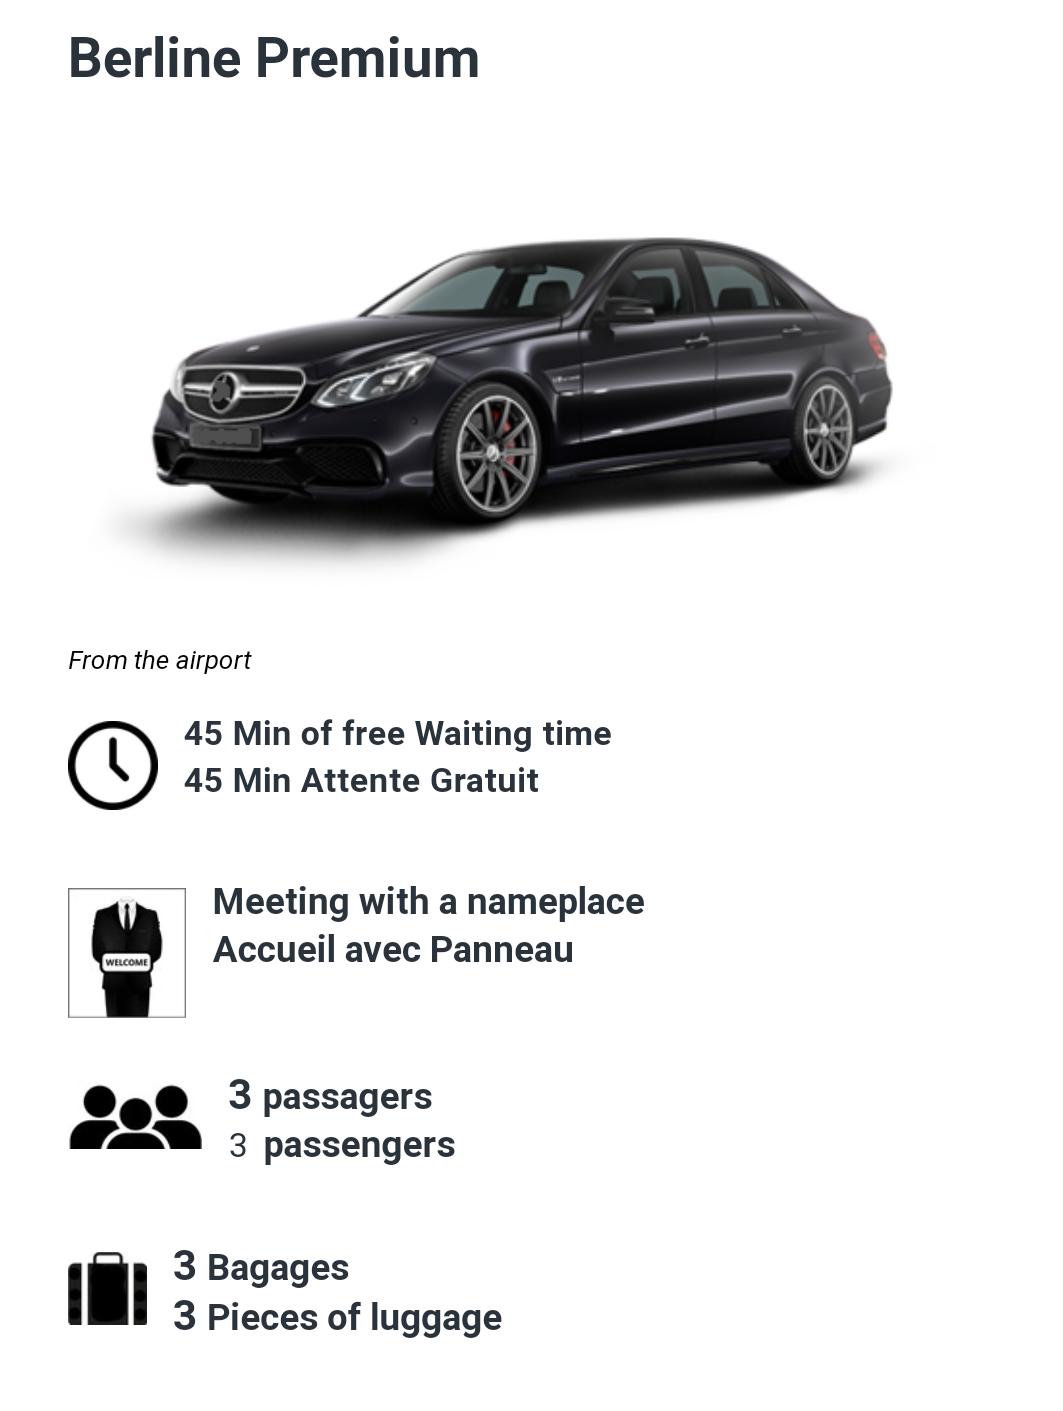 3 Passenger luxury car